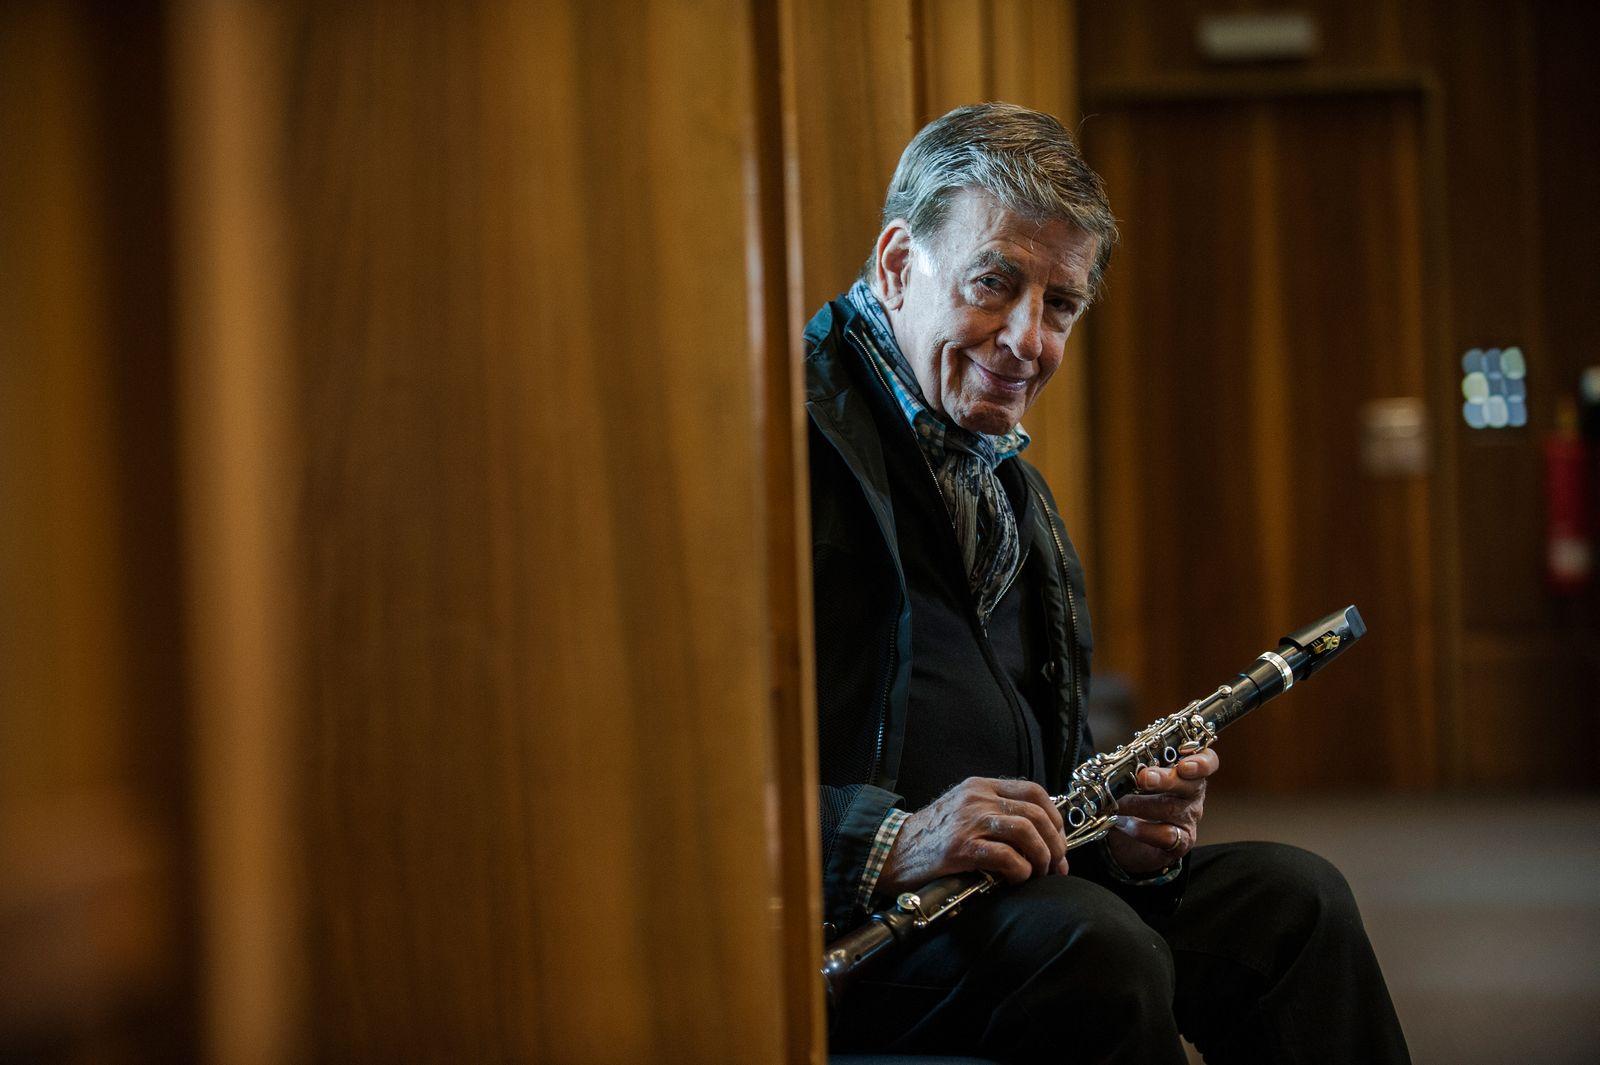 Jazz-Legende Rolf Kühn